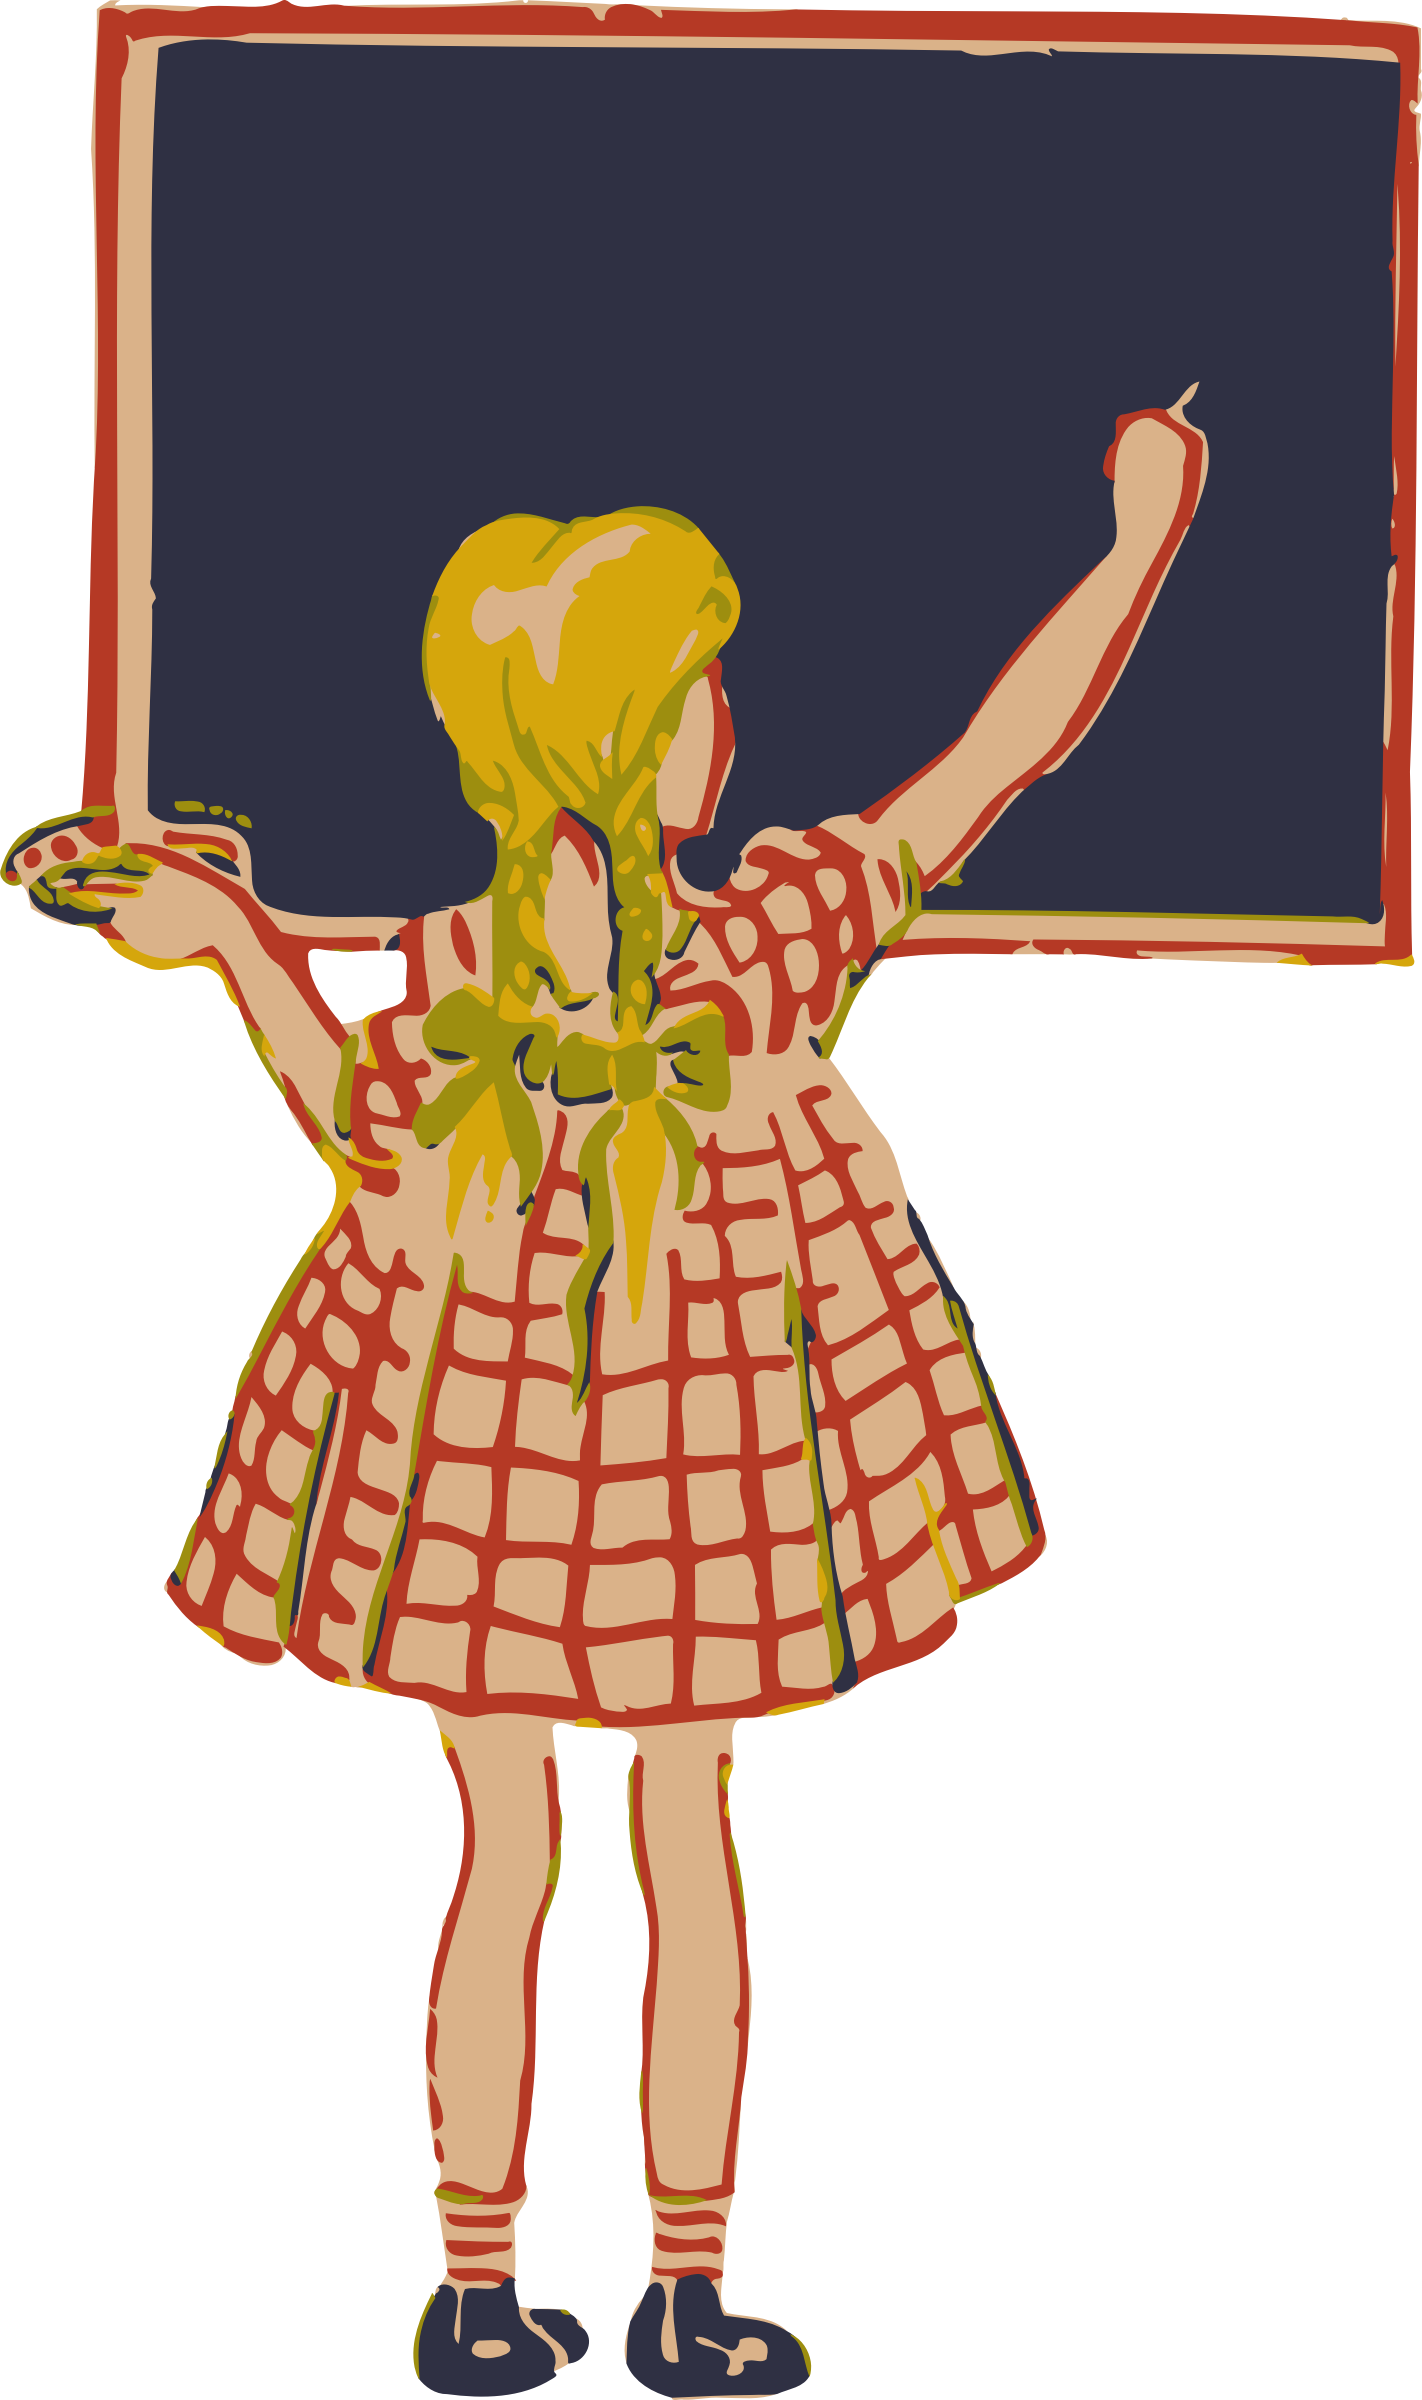 Girl and blackboard big. Costume clipart theater costume